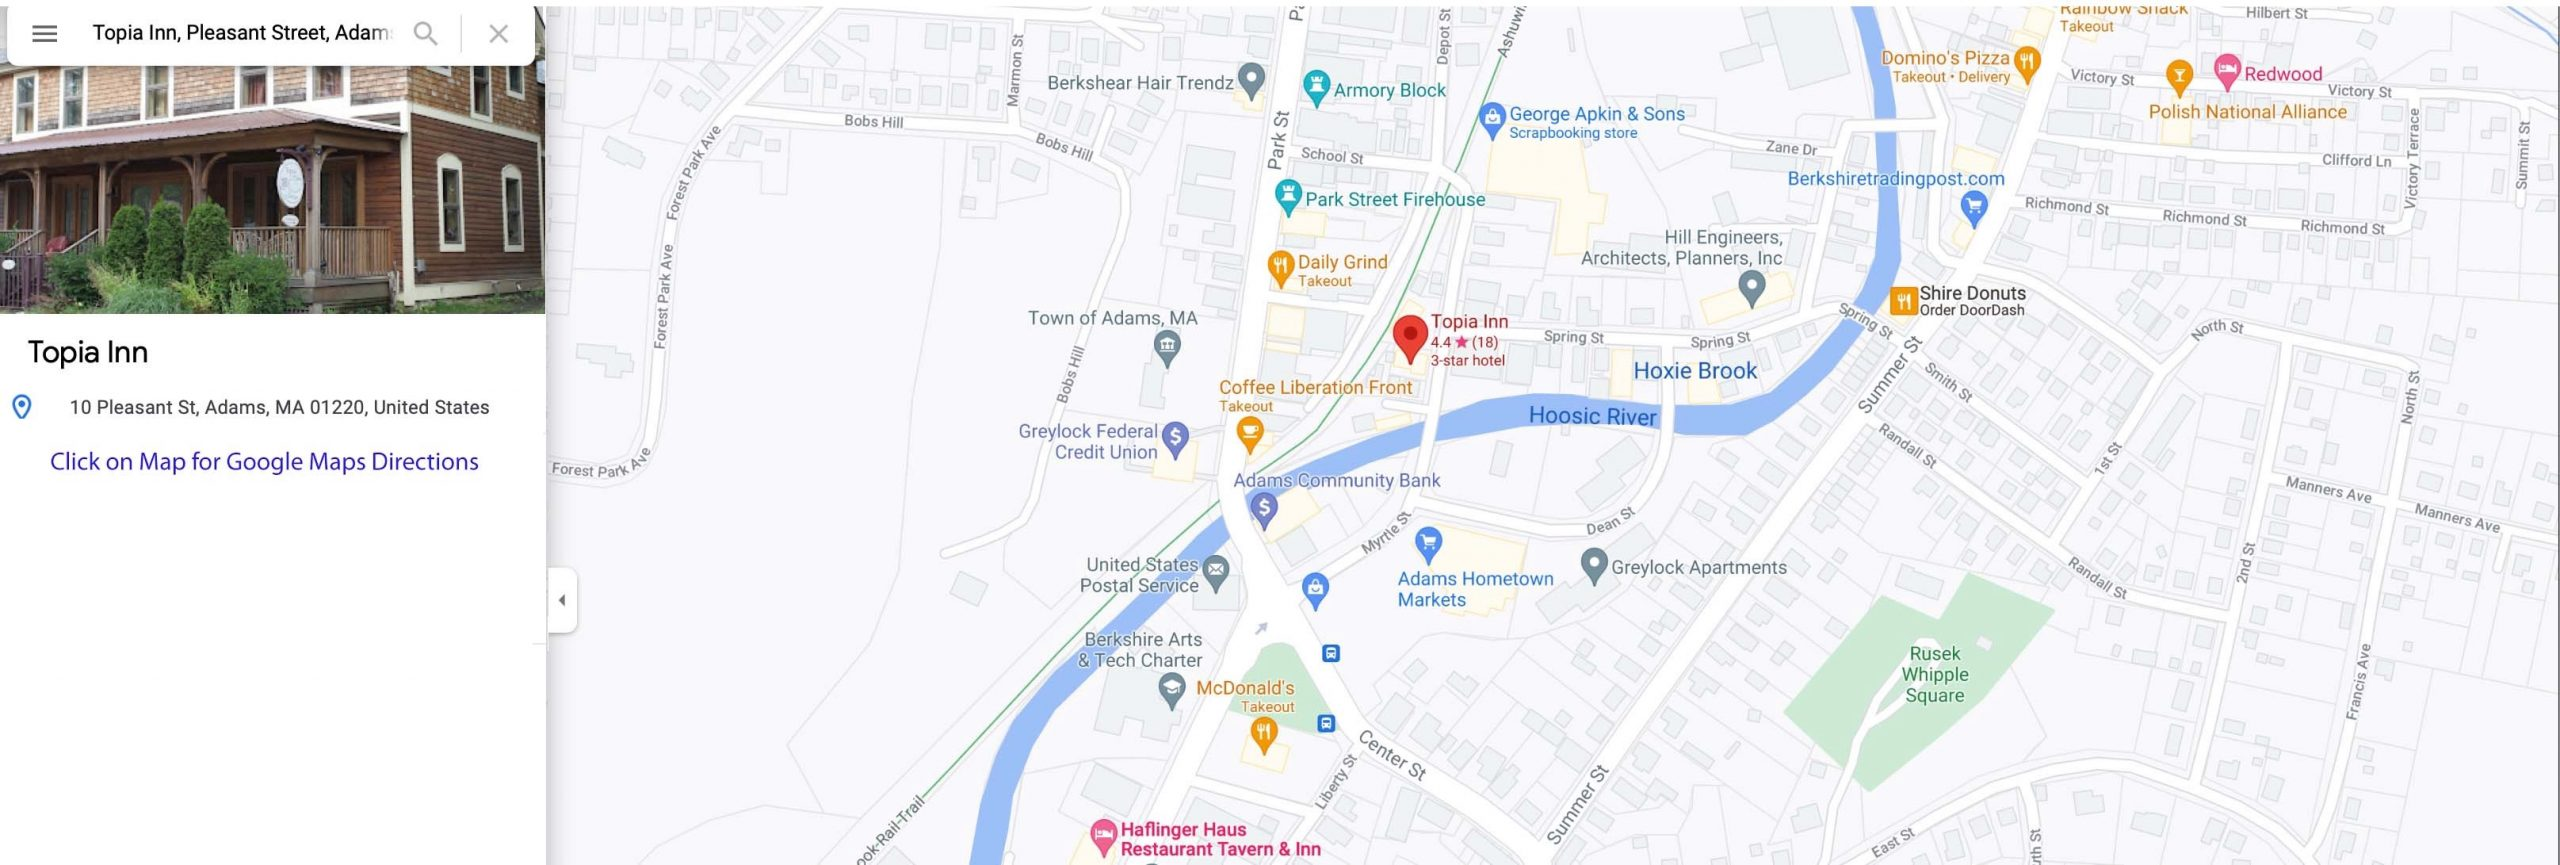 Image of the Topia Inn Google Map